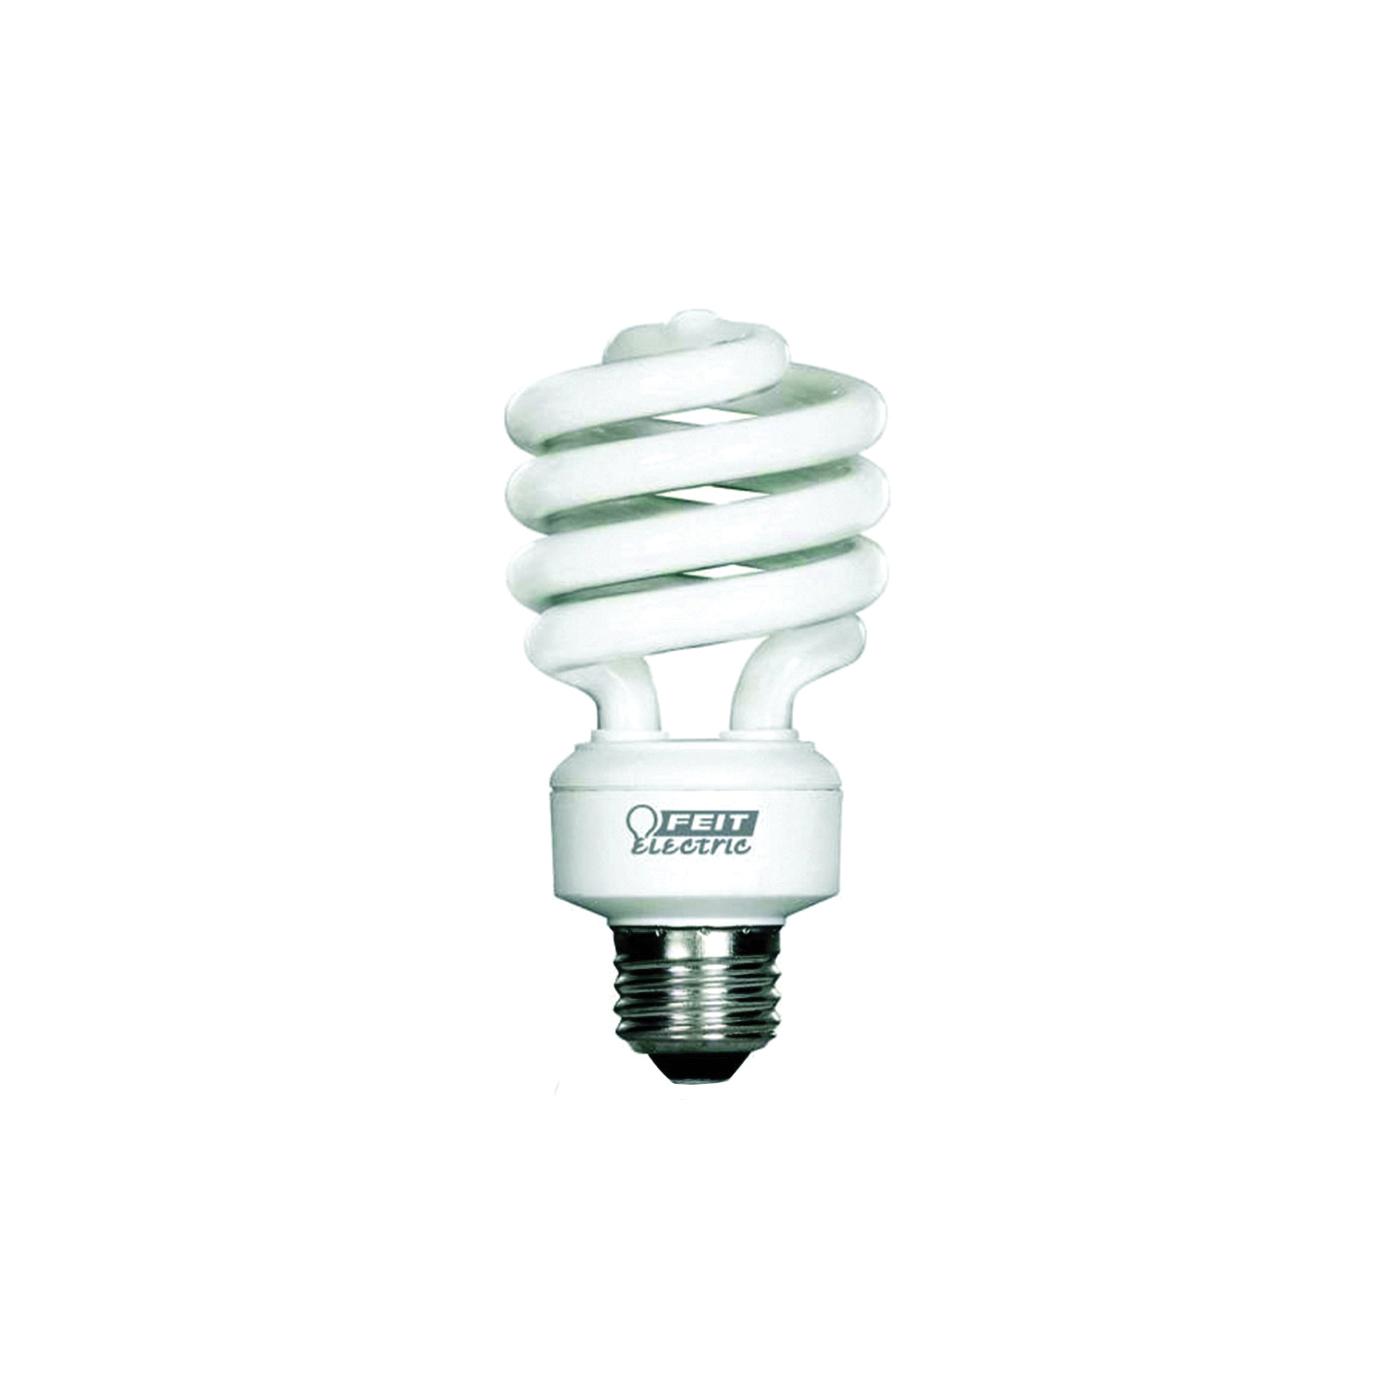 Picture of Feit Electric BPESL23TM Compact Fluorescent Light, 23 W, Spiral Lamp, Medium E26 Lamp Base, 1600 Lumens